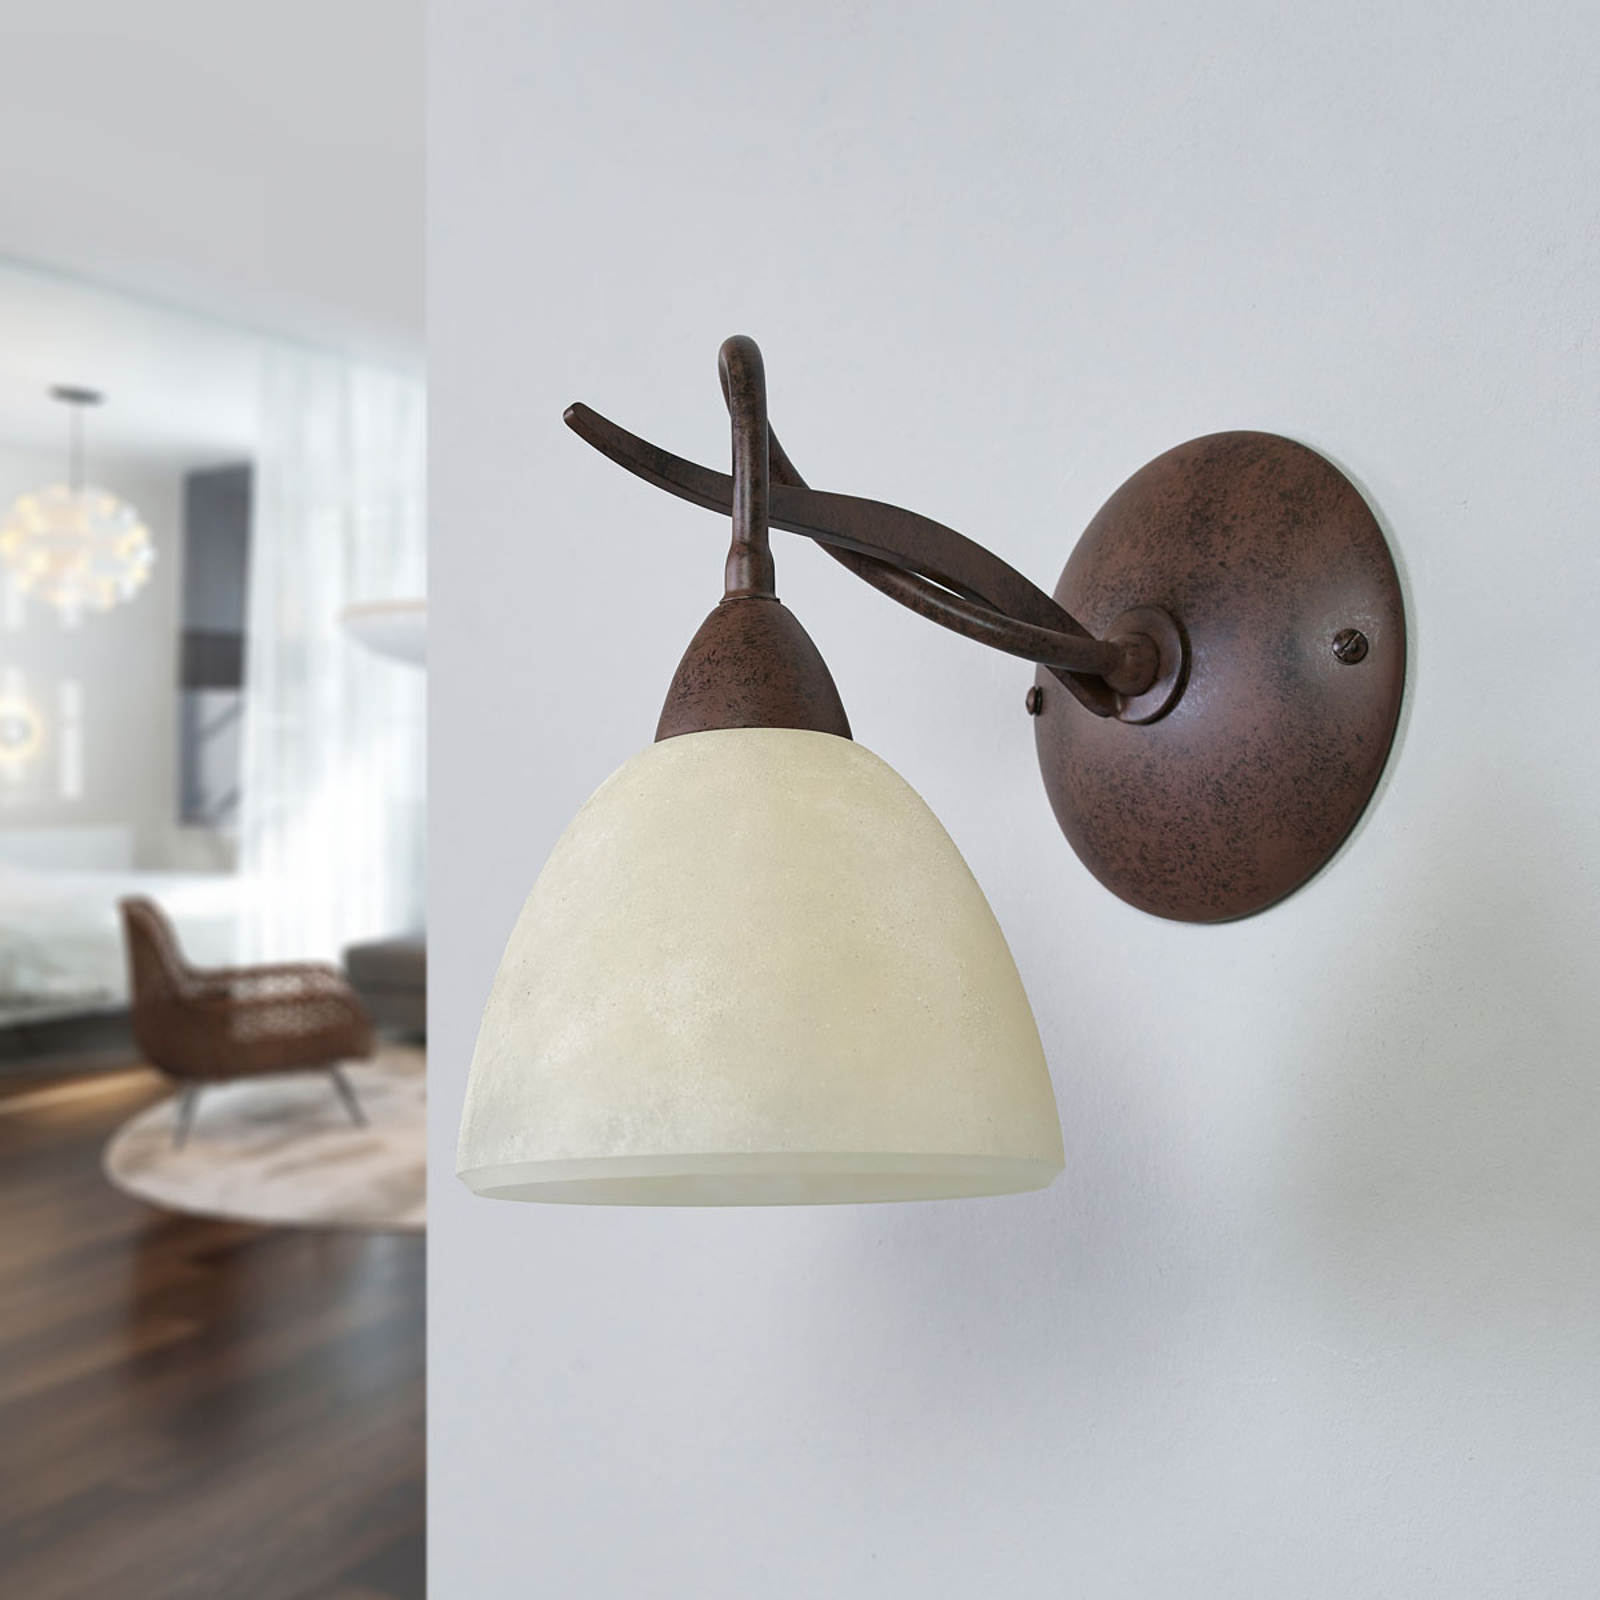 Vegglampe Samuele i landlig stil, scavoglass